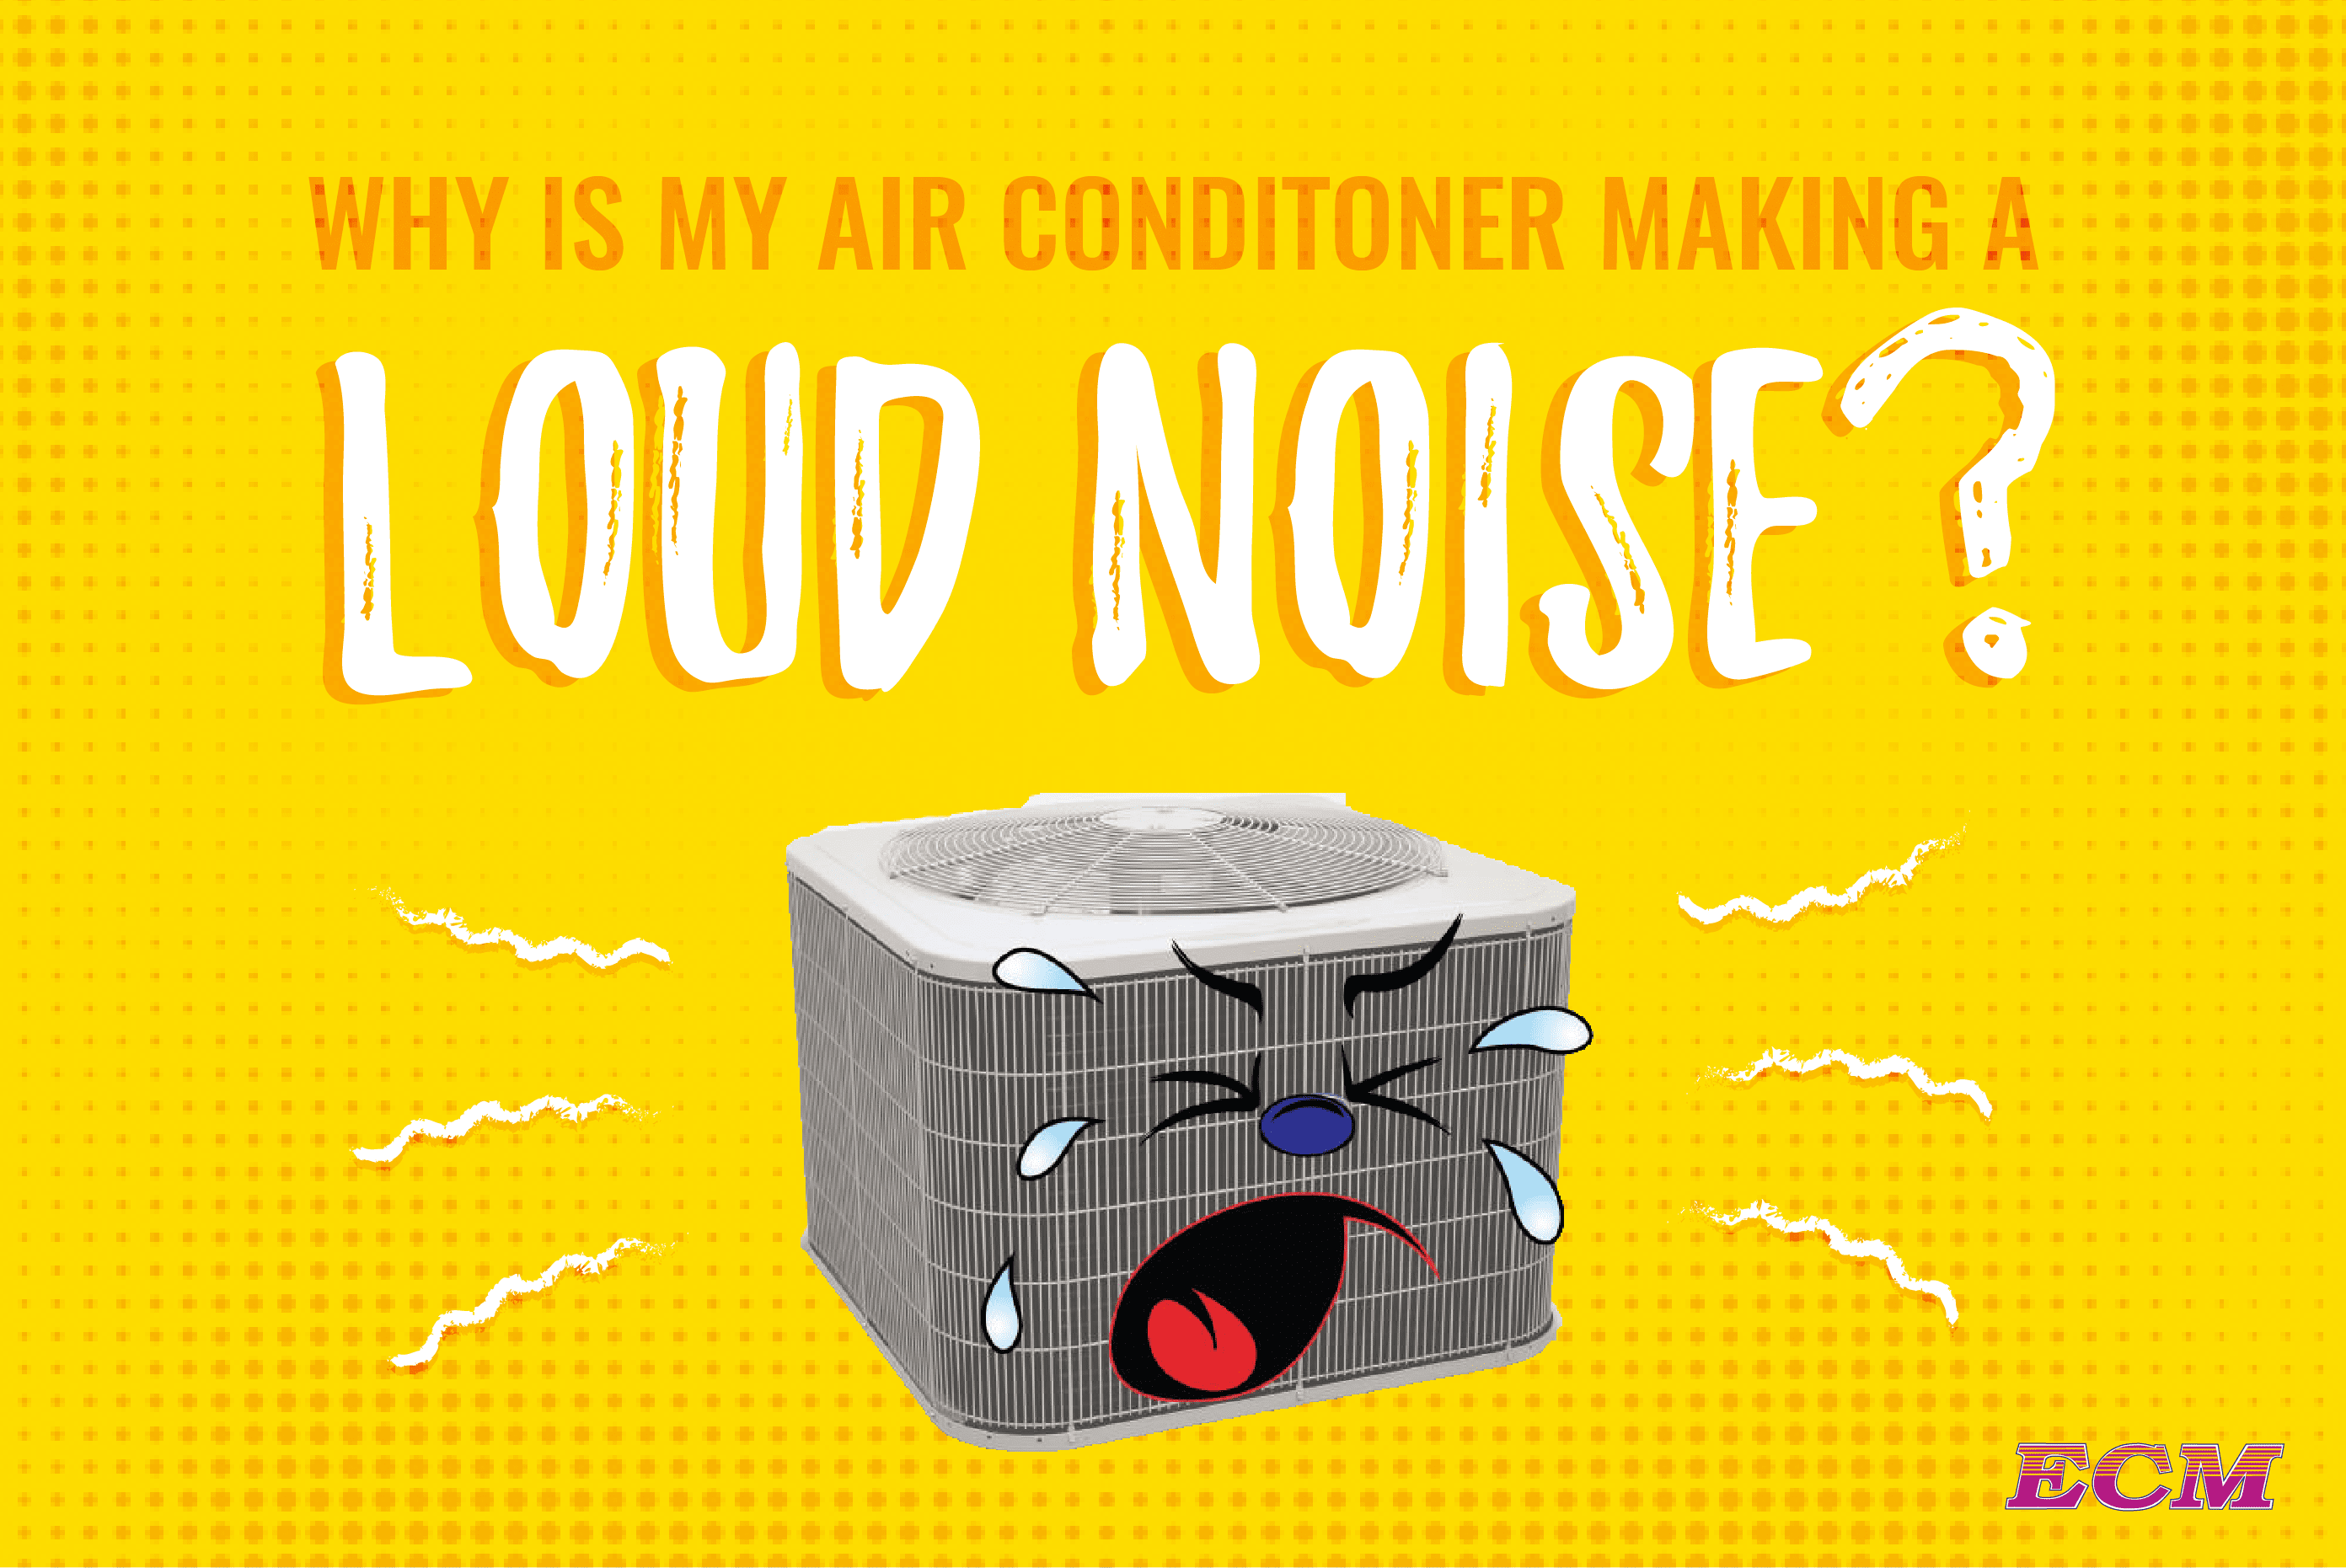 AC Making a Loud Noise